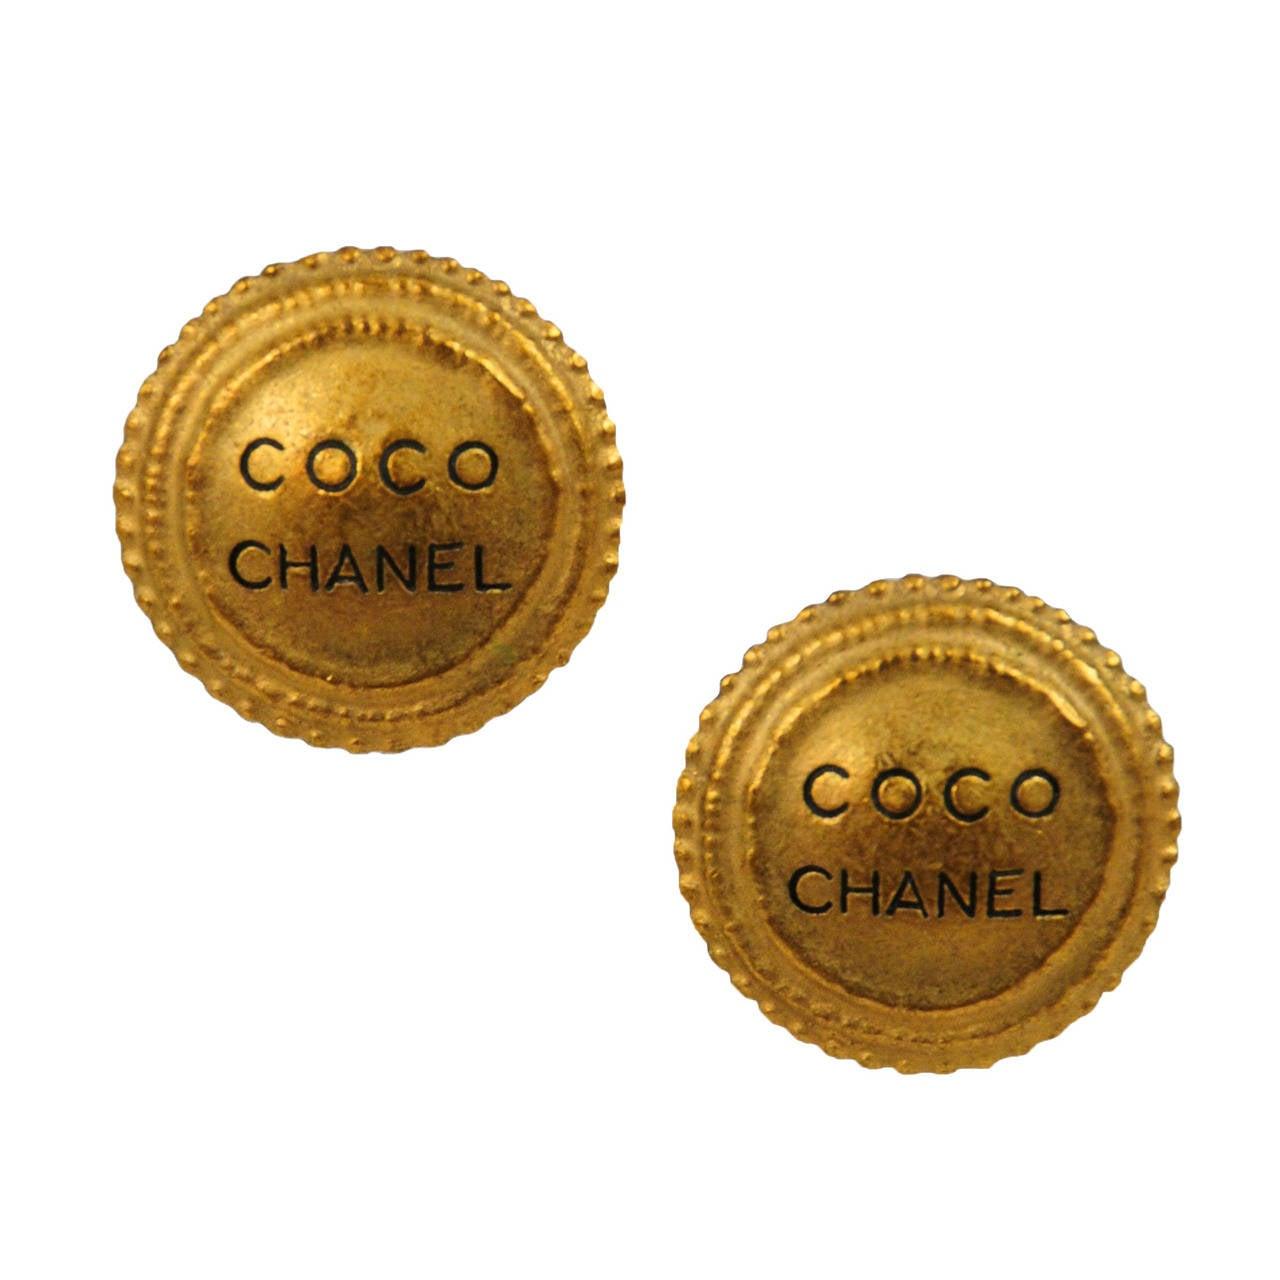 Coco channel earrings : Coco chanel logo earrings at stdibs